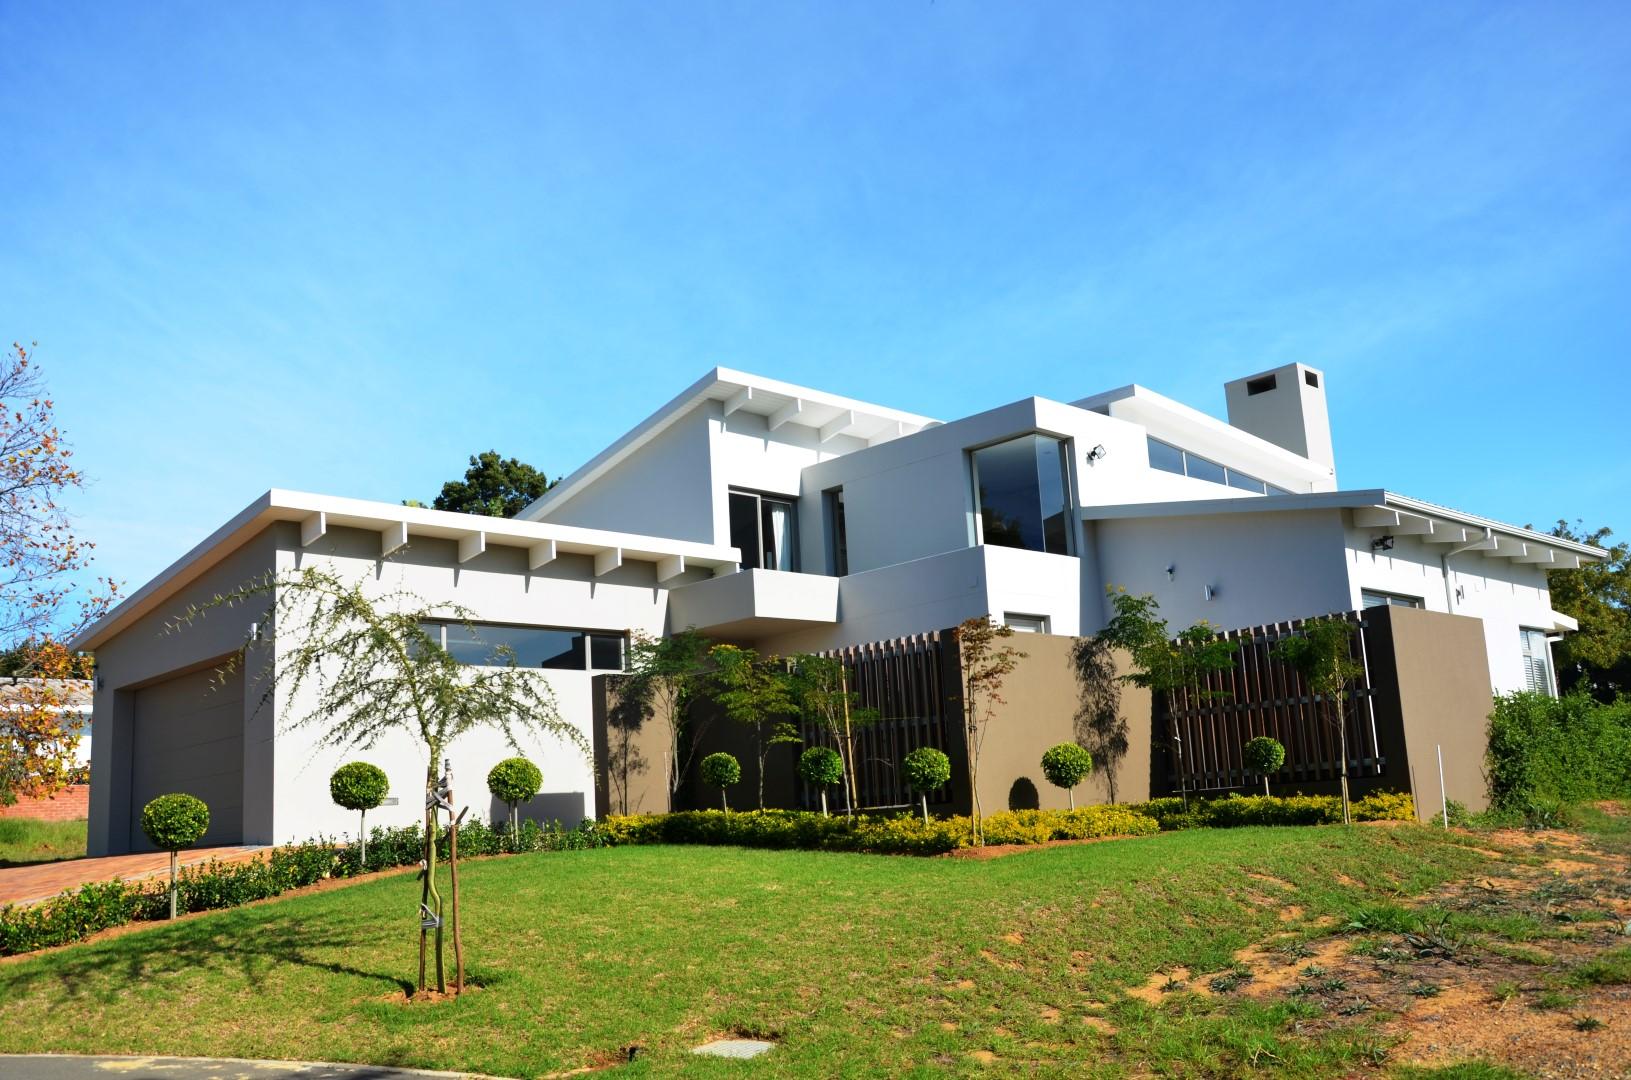 Kwali Mark Construction CC